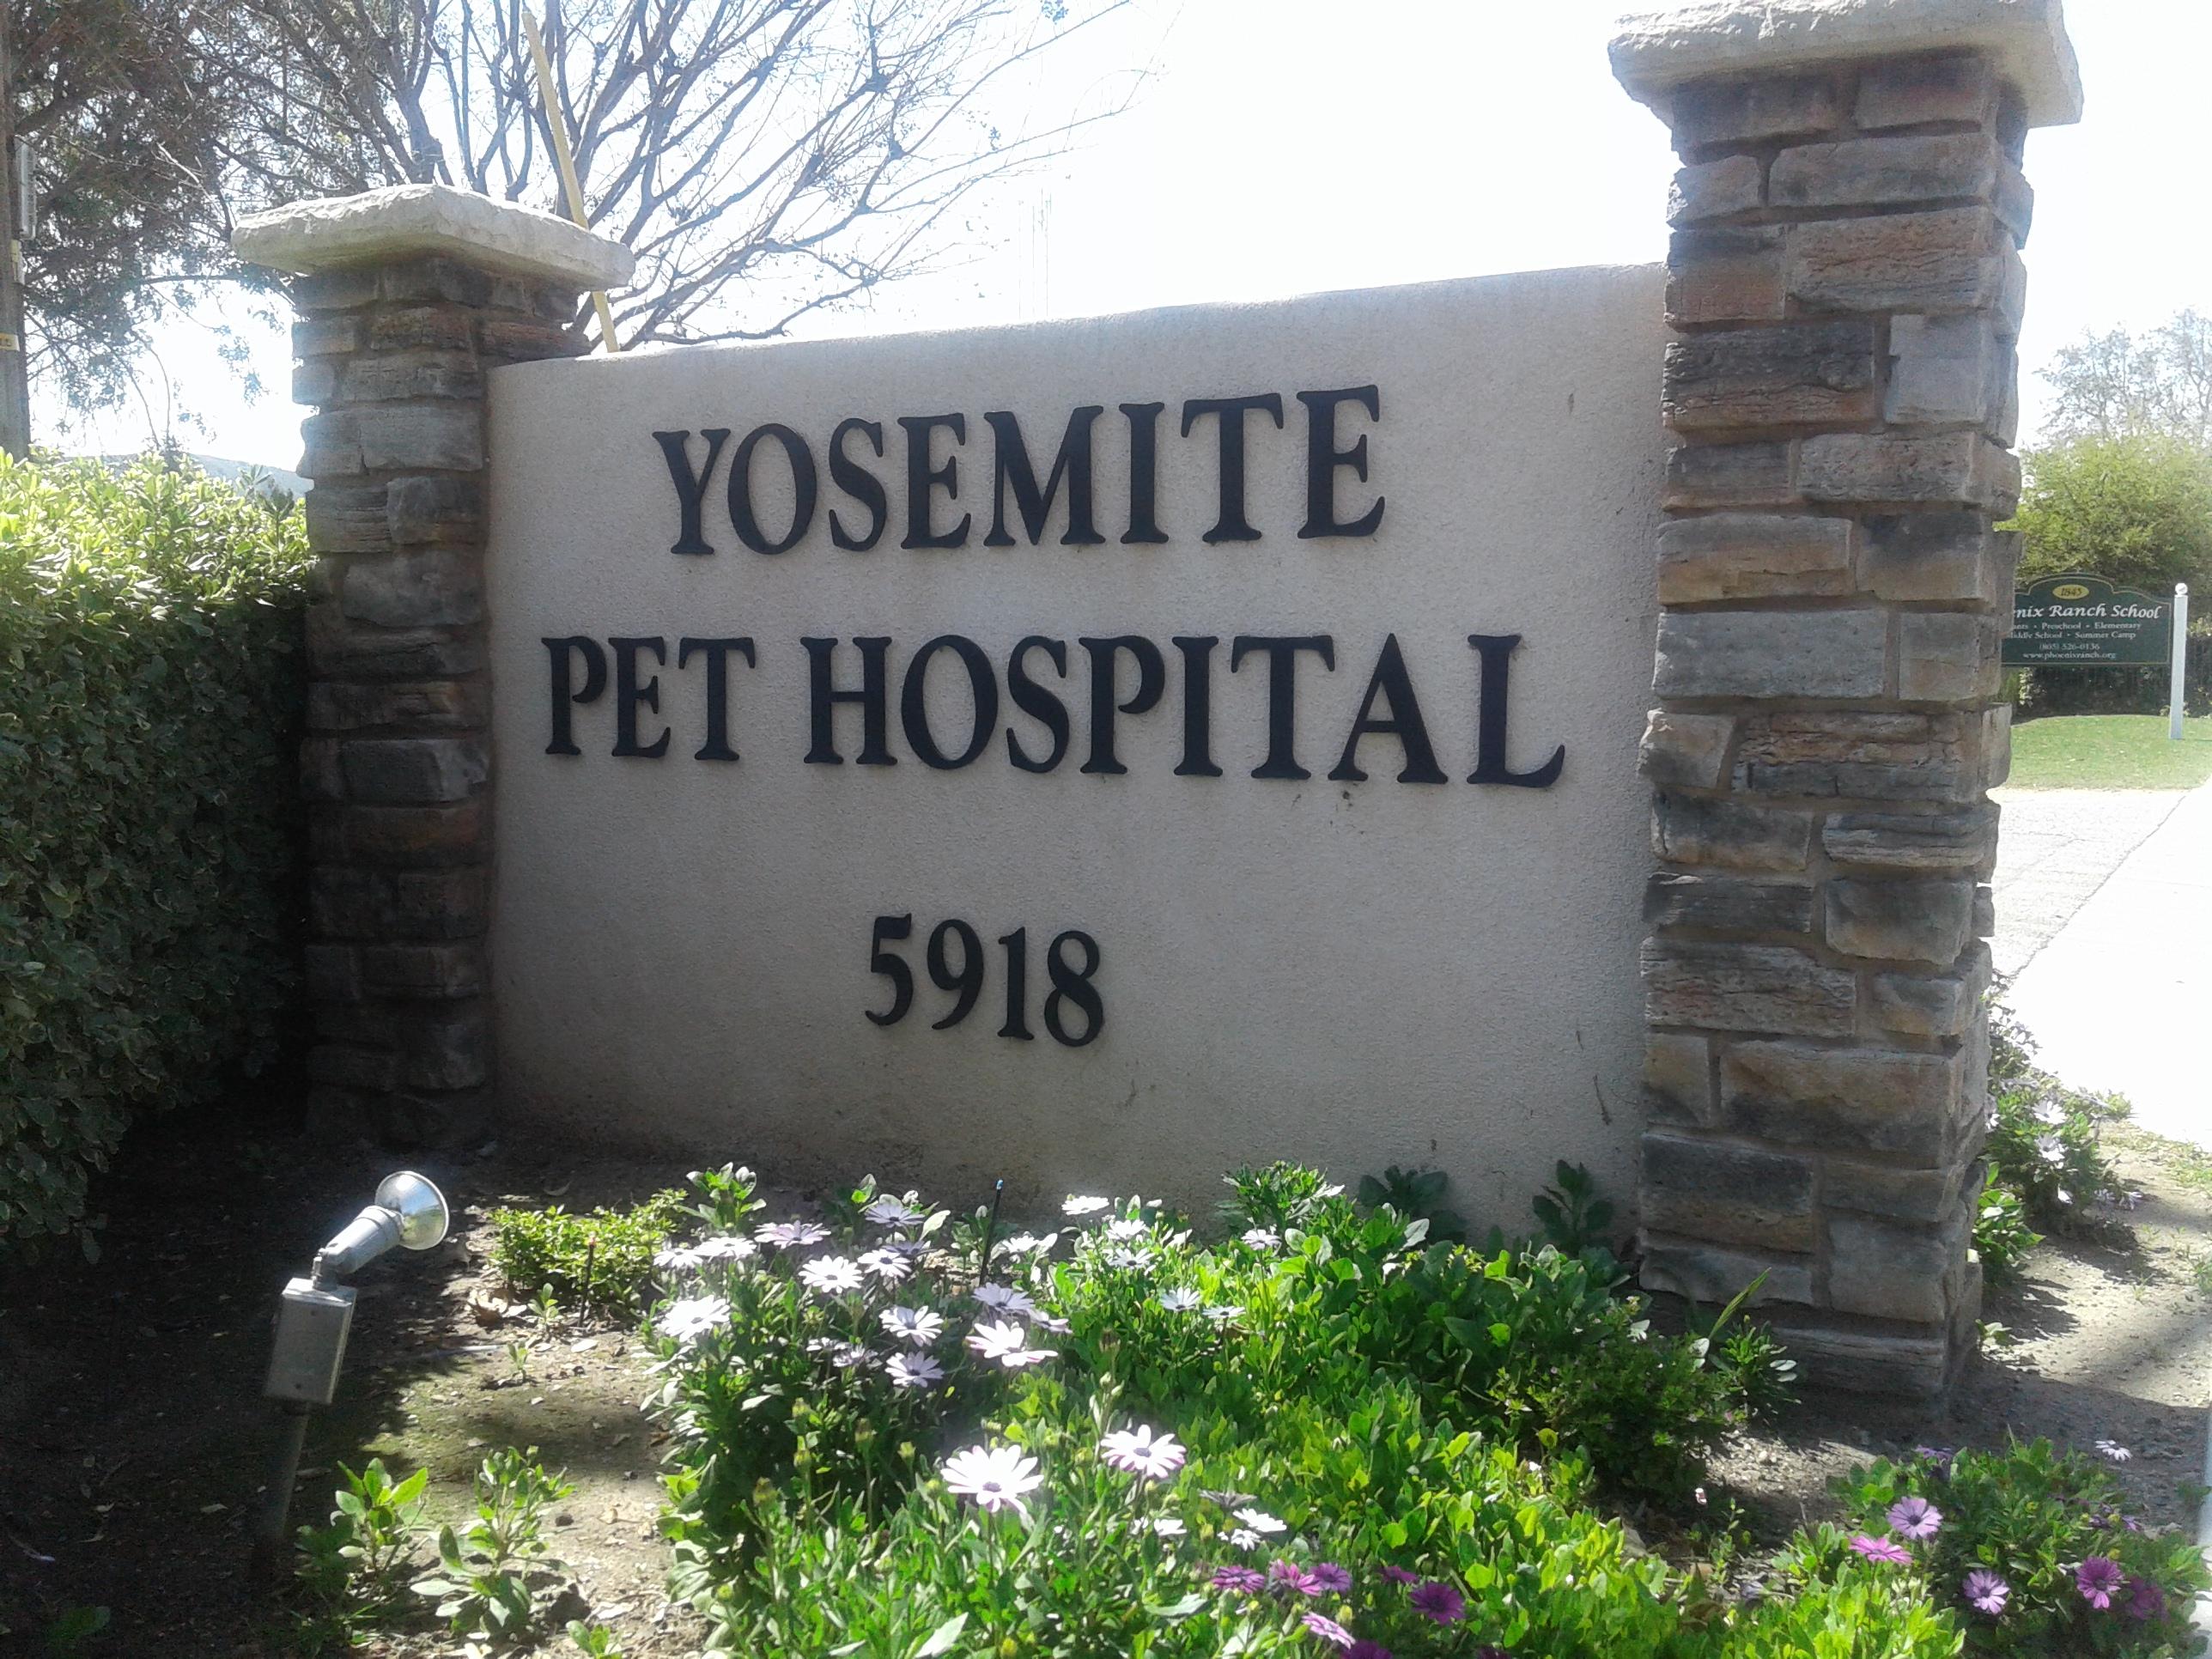 Yosemite Pet Hospital image 5